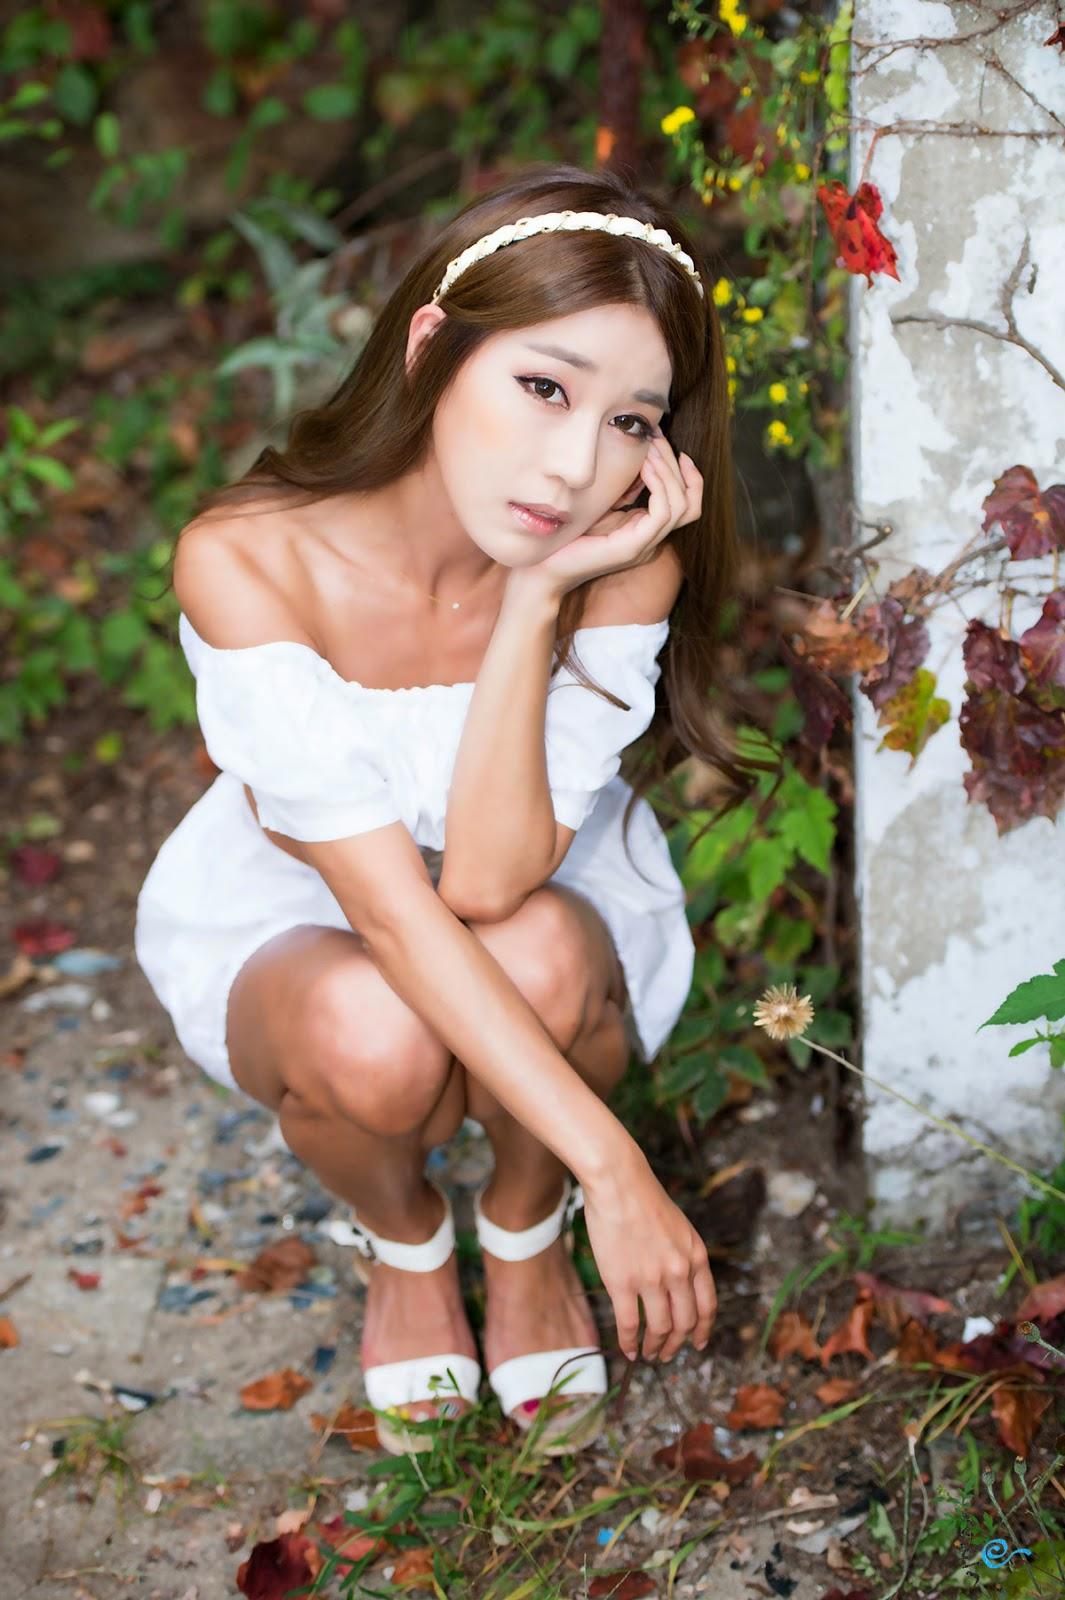 Model Park Si Hyun's outdoor photoshoot